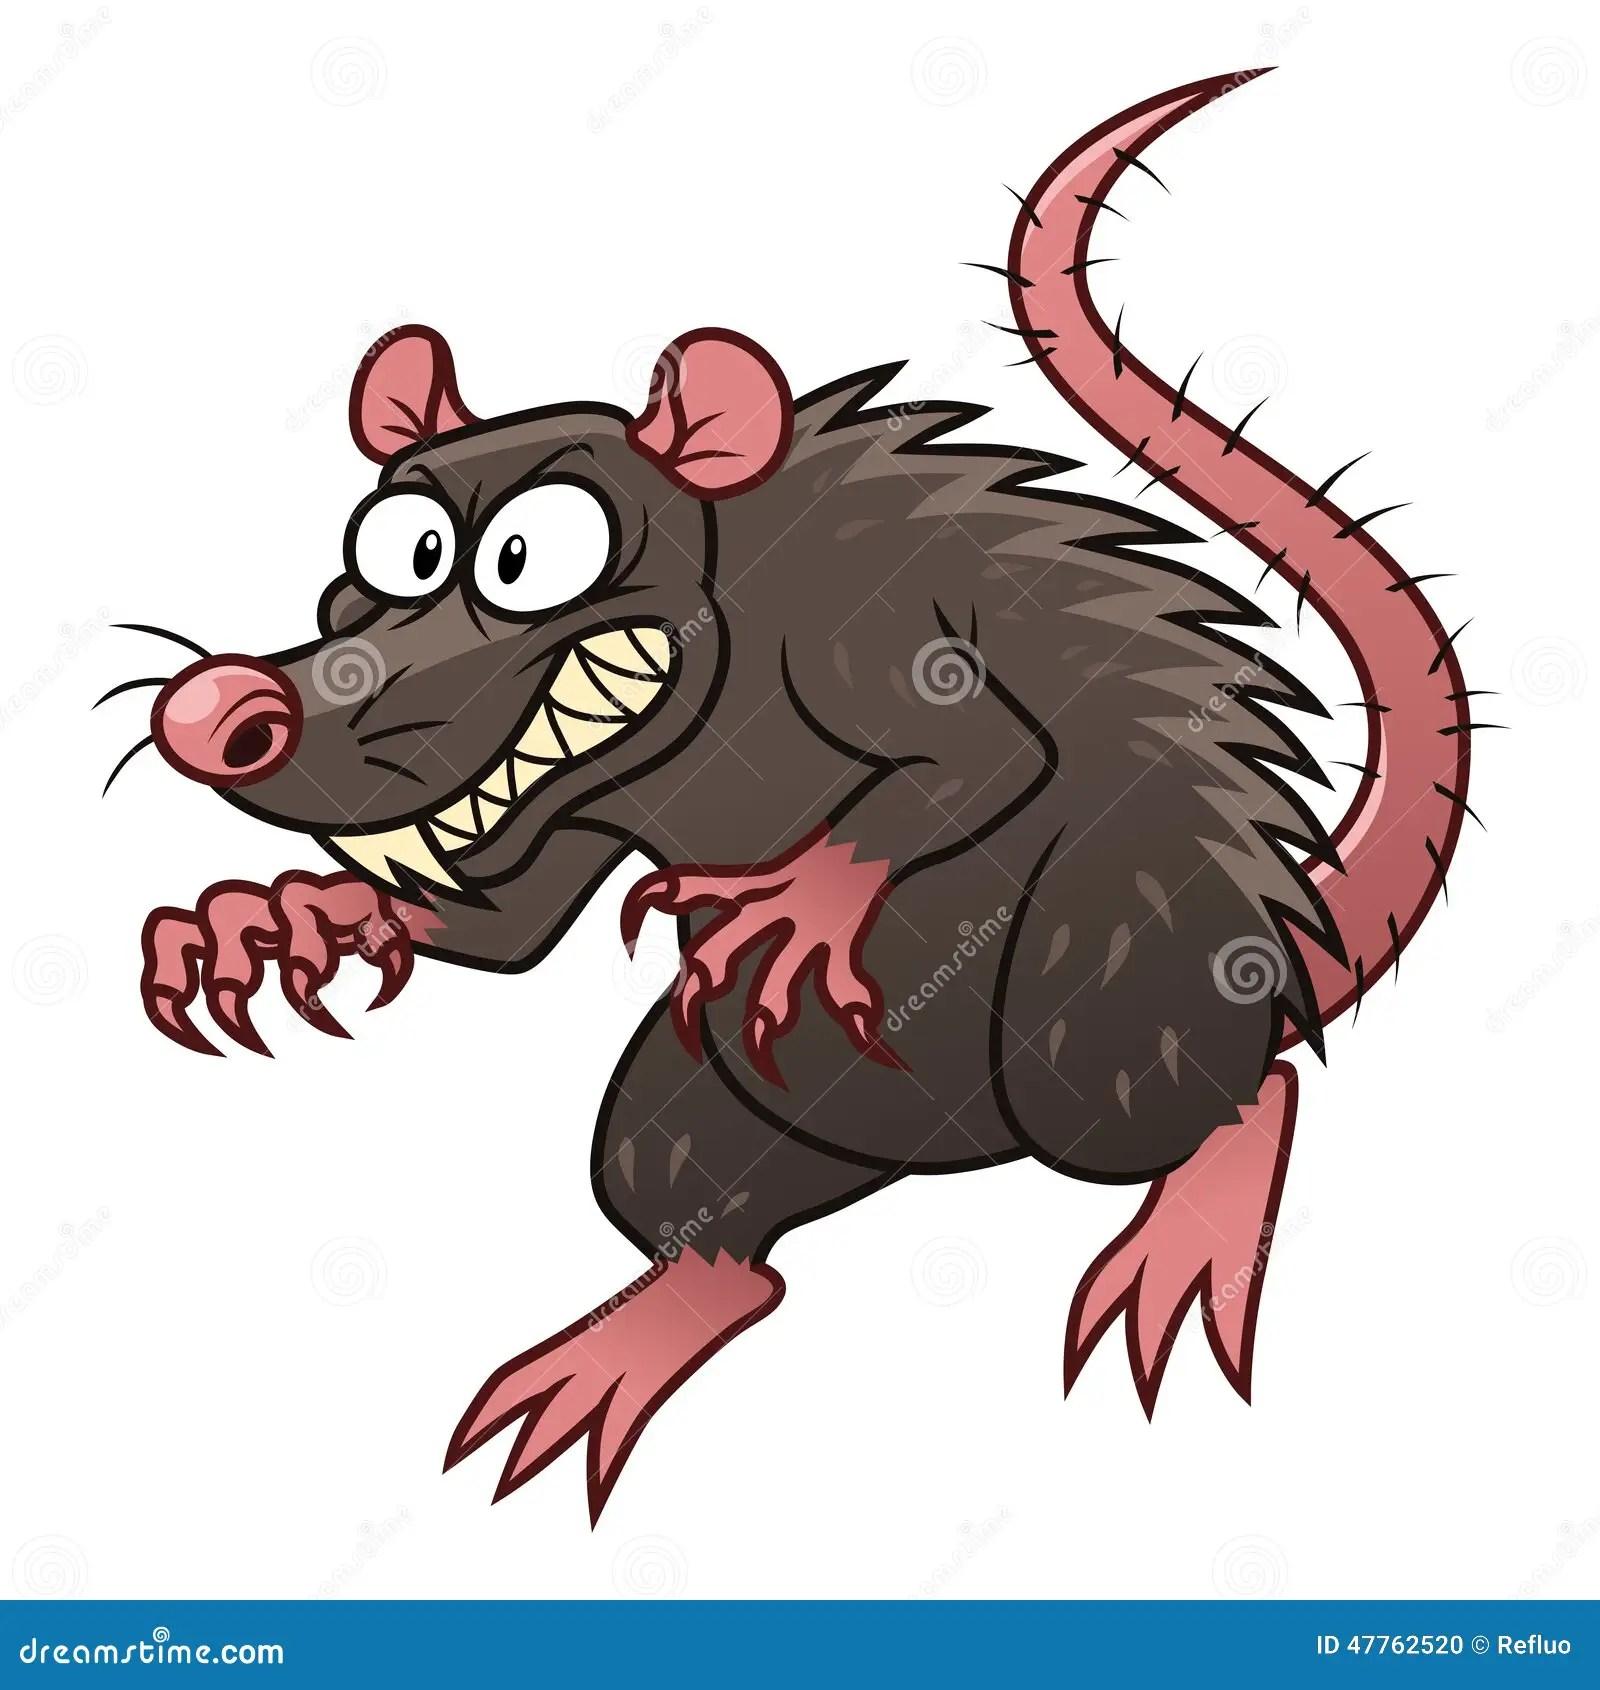 https://i1.wp.com/thumbs.dreamstime.com/z/evil-rat-cartoon-malicious-white-background-47762520.jpg